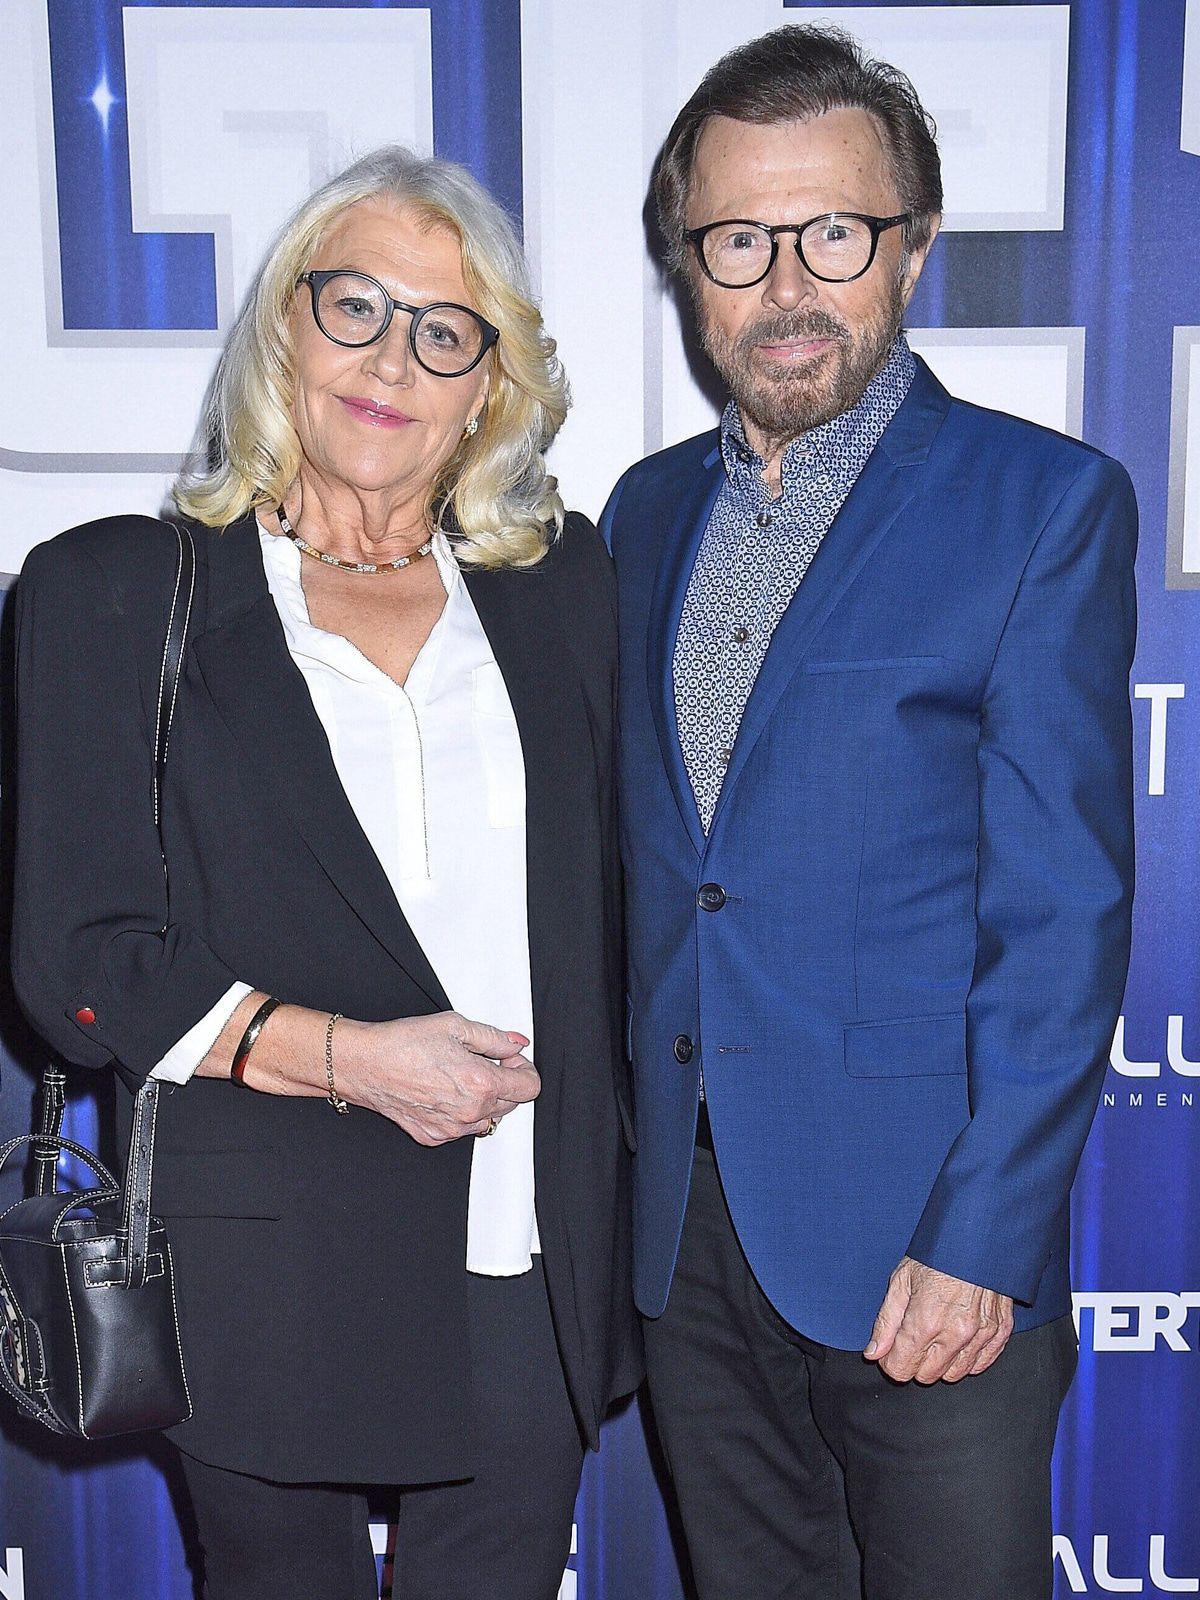 Lena and Bjorn Ulvaeus